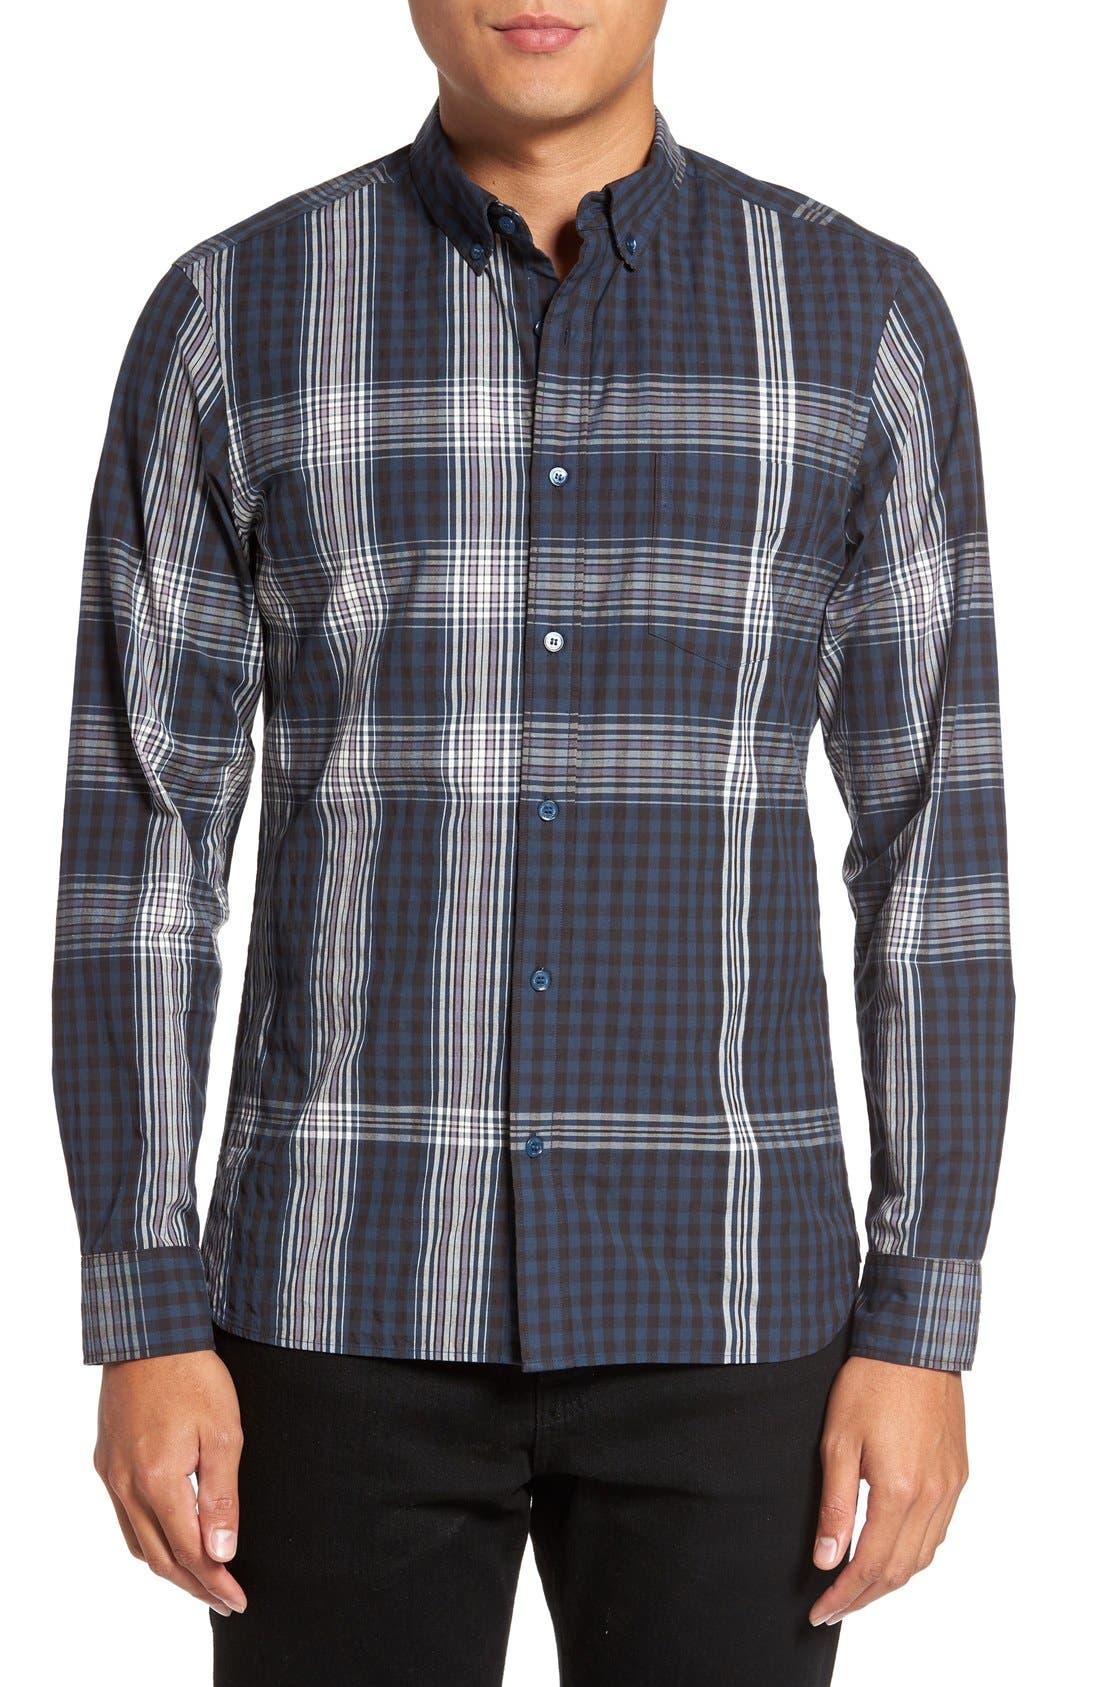 Main Image - Burberry 'Blackrock' Trim Fit Plaid Sport Shirt